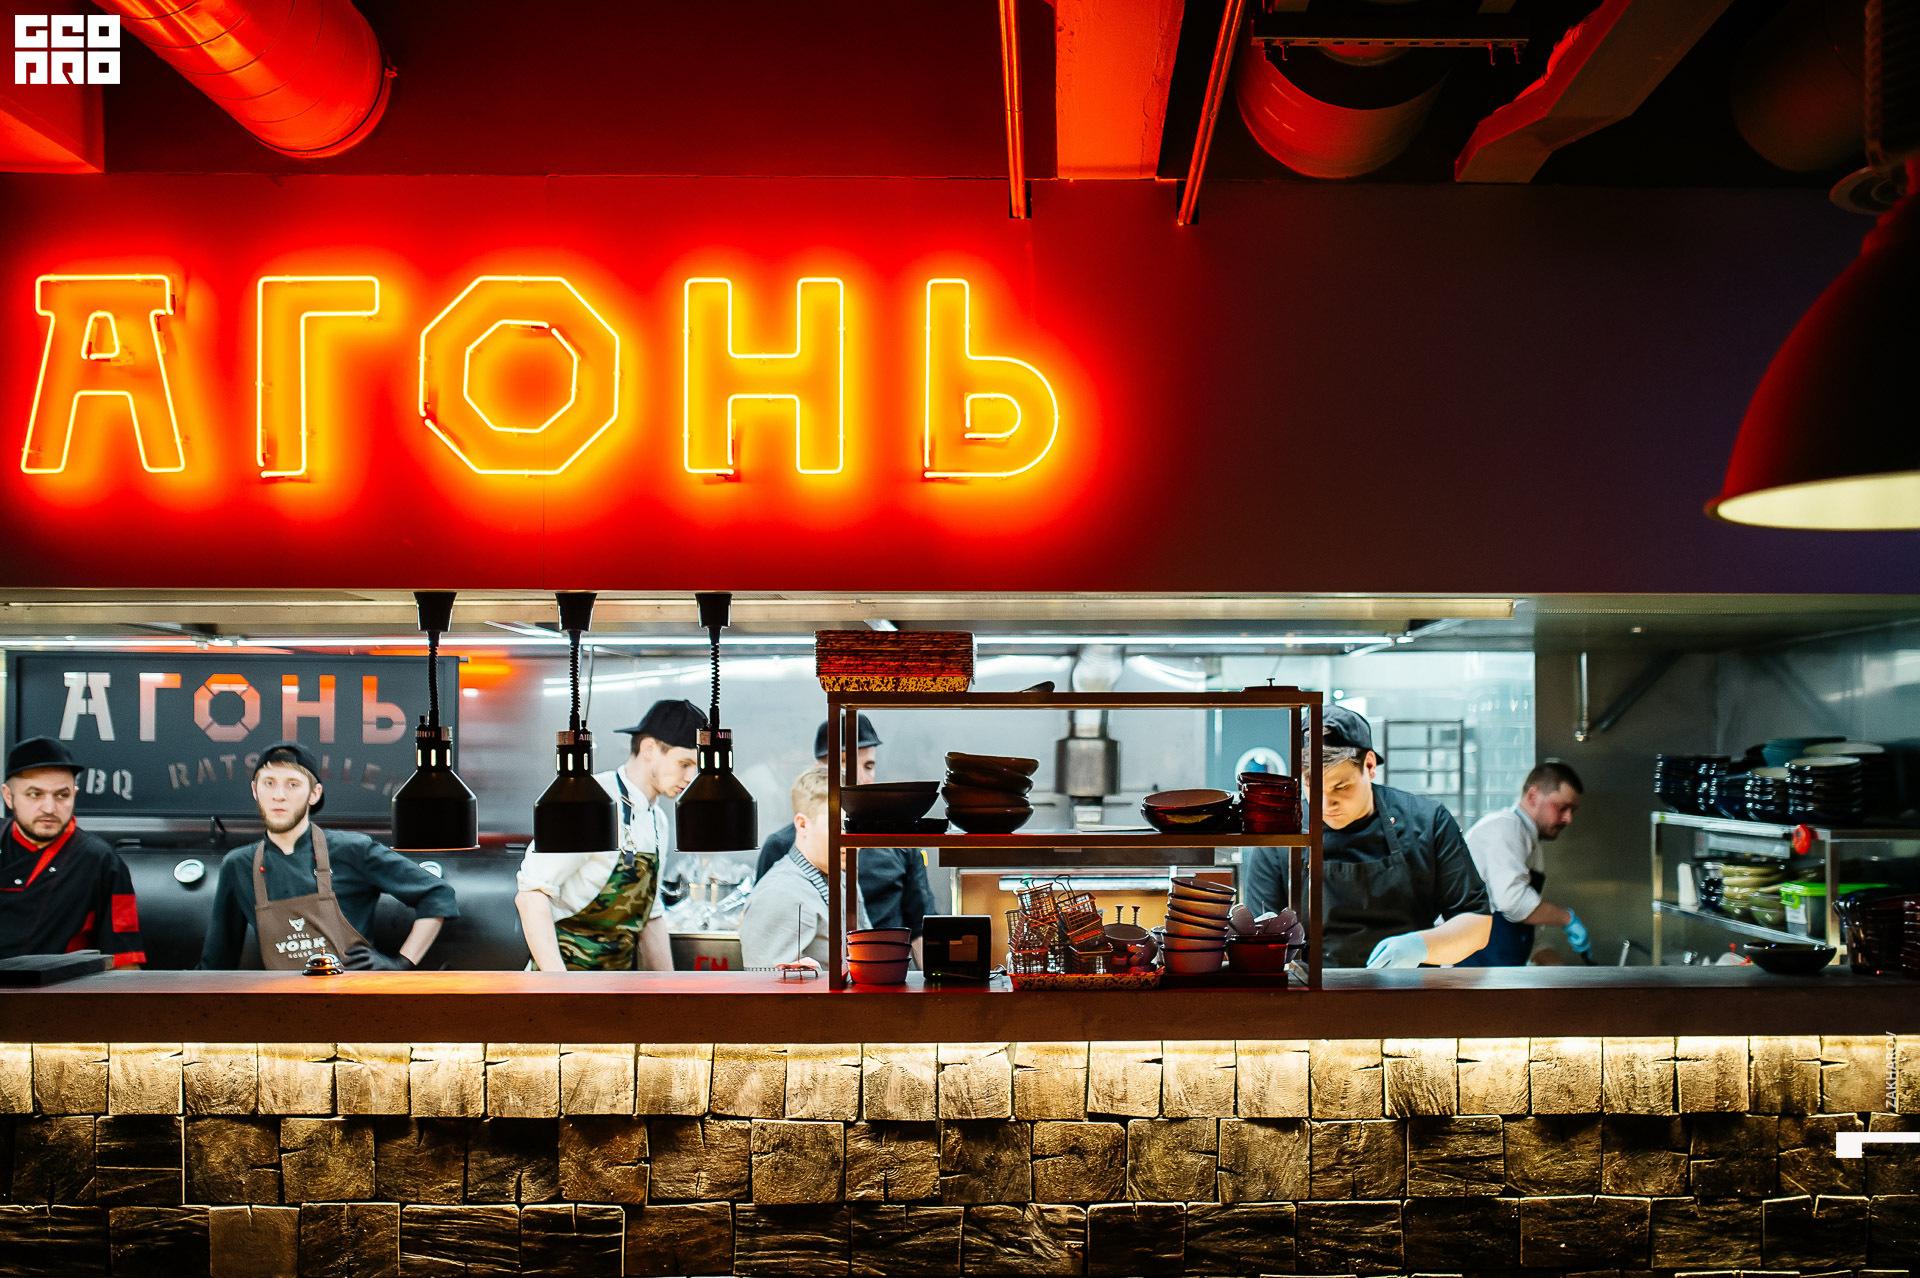 Фотография: Ресторан Агонь BBQ RatsKeller